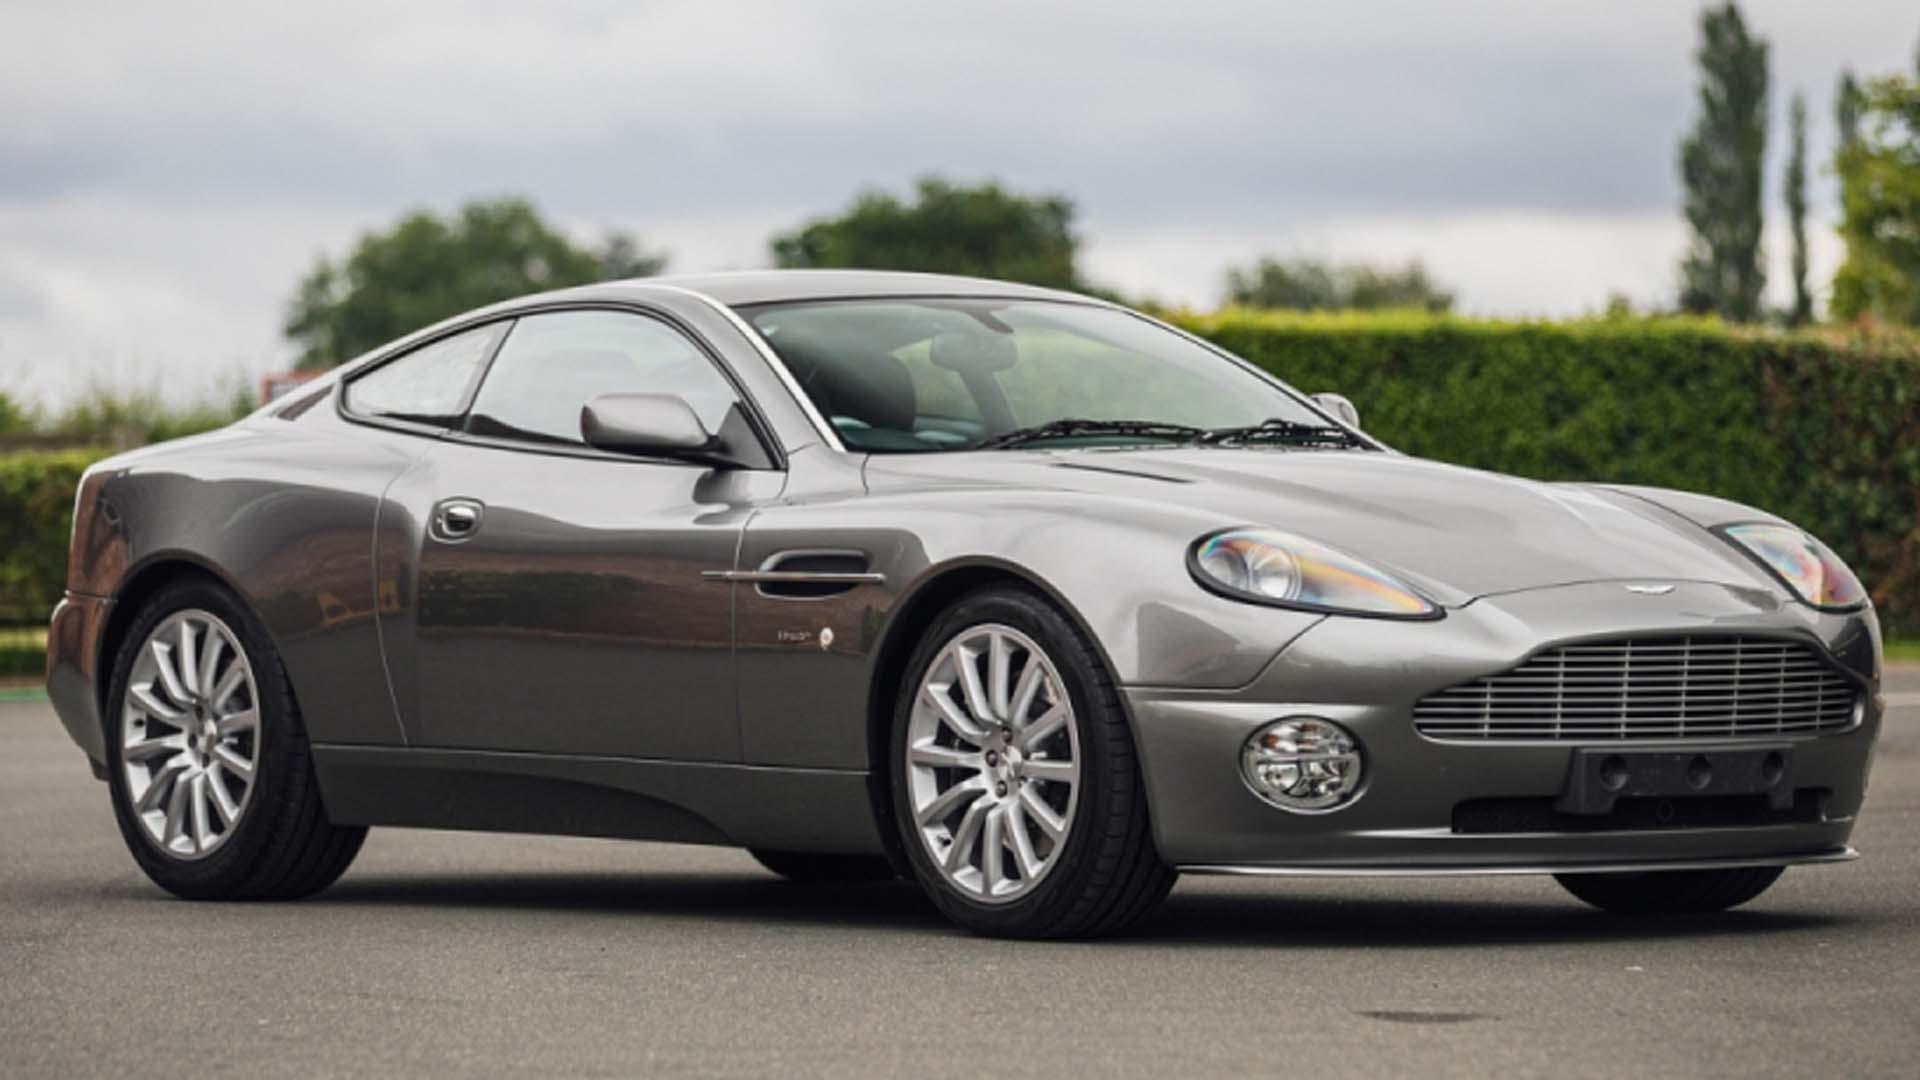 Royal Family S 2003 Aston Martin V12 Vanquish Heading To Auction